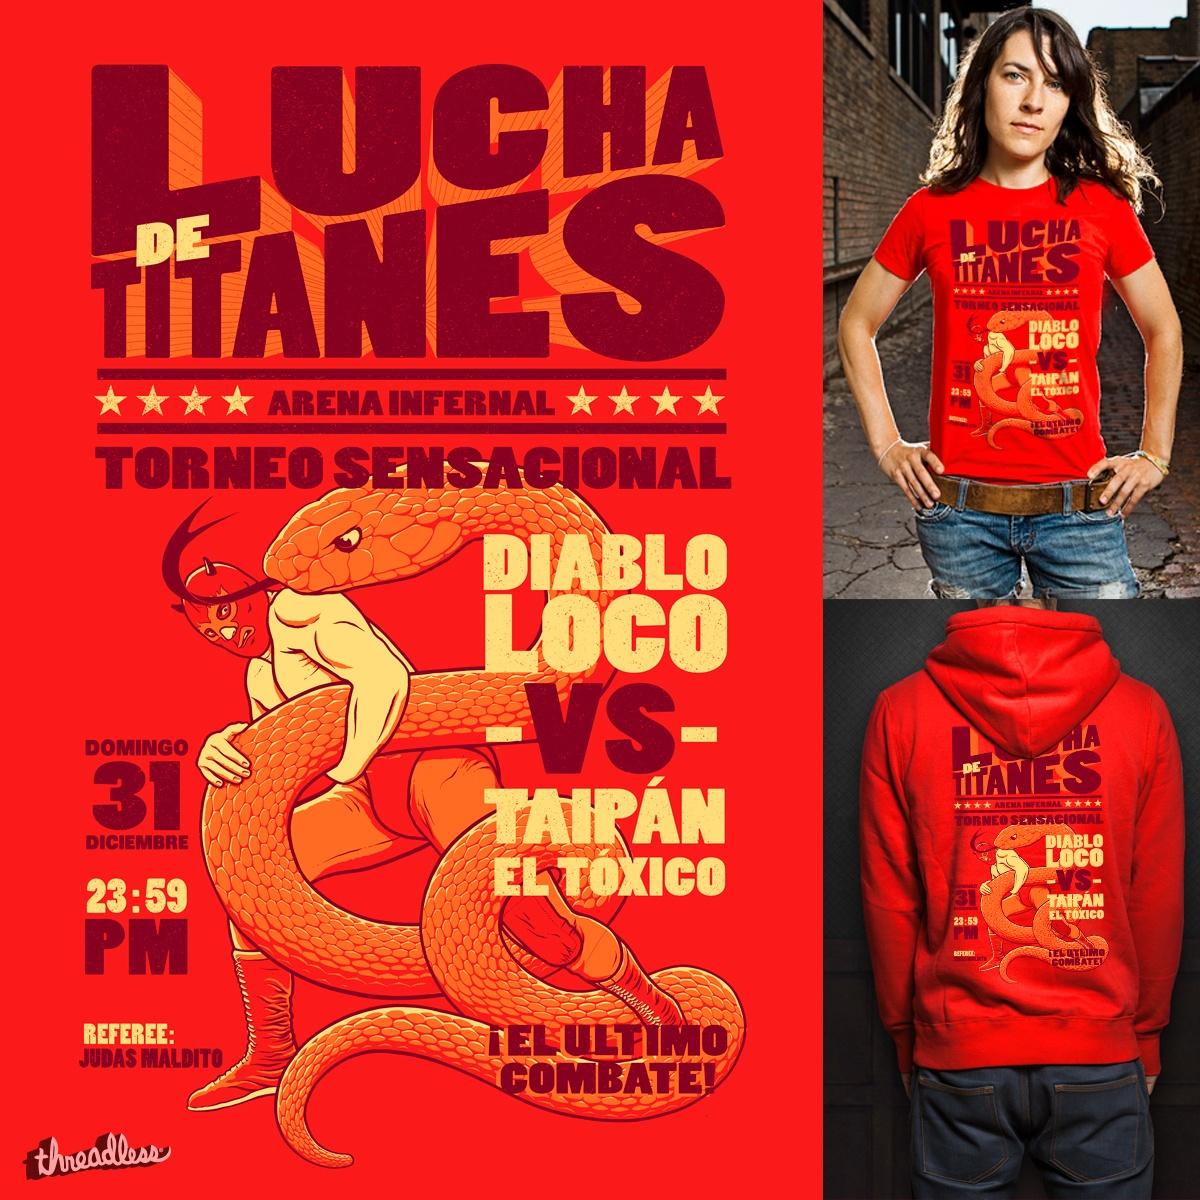 Lucha de Titanes by v_calahan on Threadless